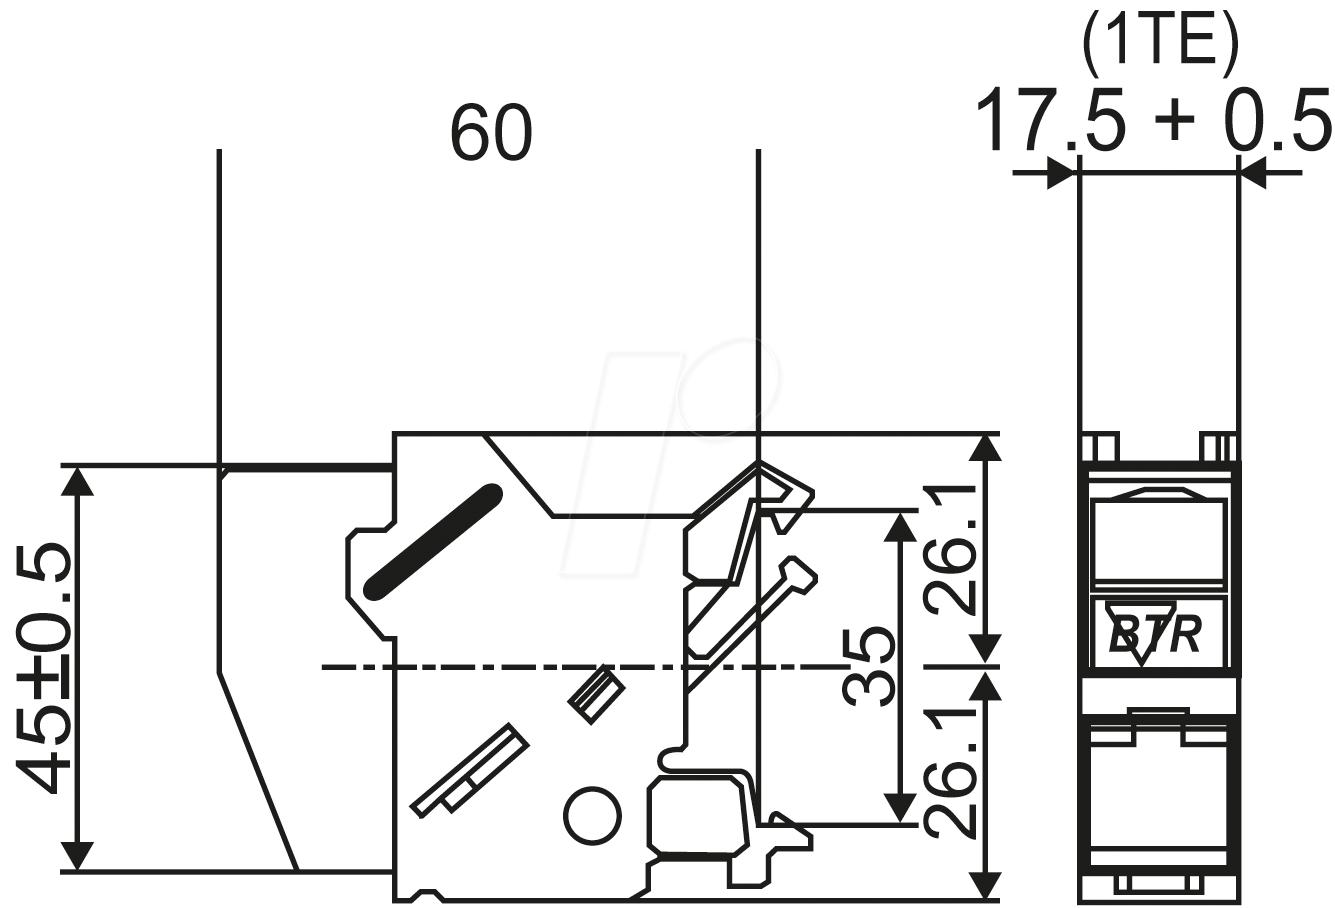 town car radio wiring diagram wiring diagram collections m19 wiring diagram